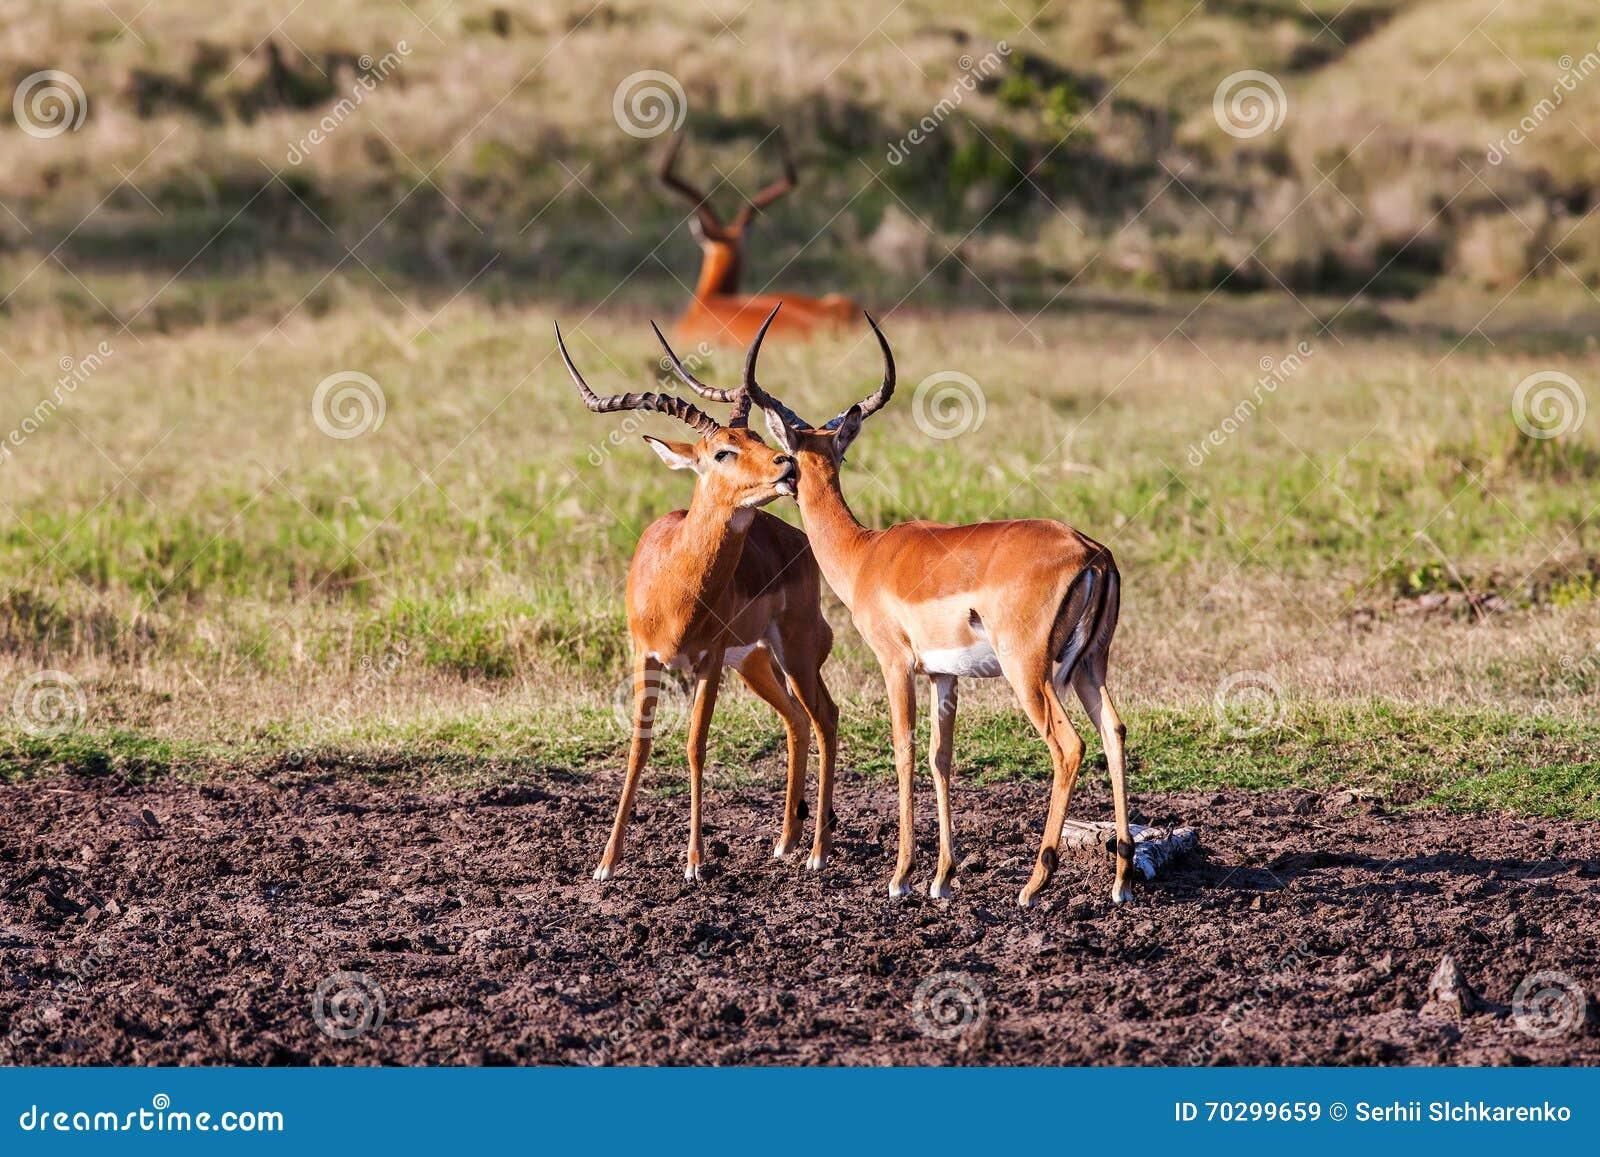 impala antelope walking on the grass landscape stock. Black Bedroom Furniture Sets. Home Design Ideas